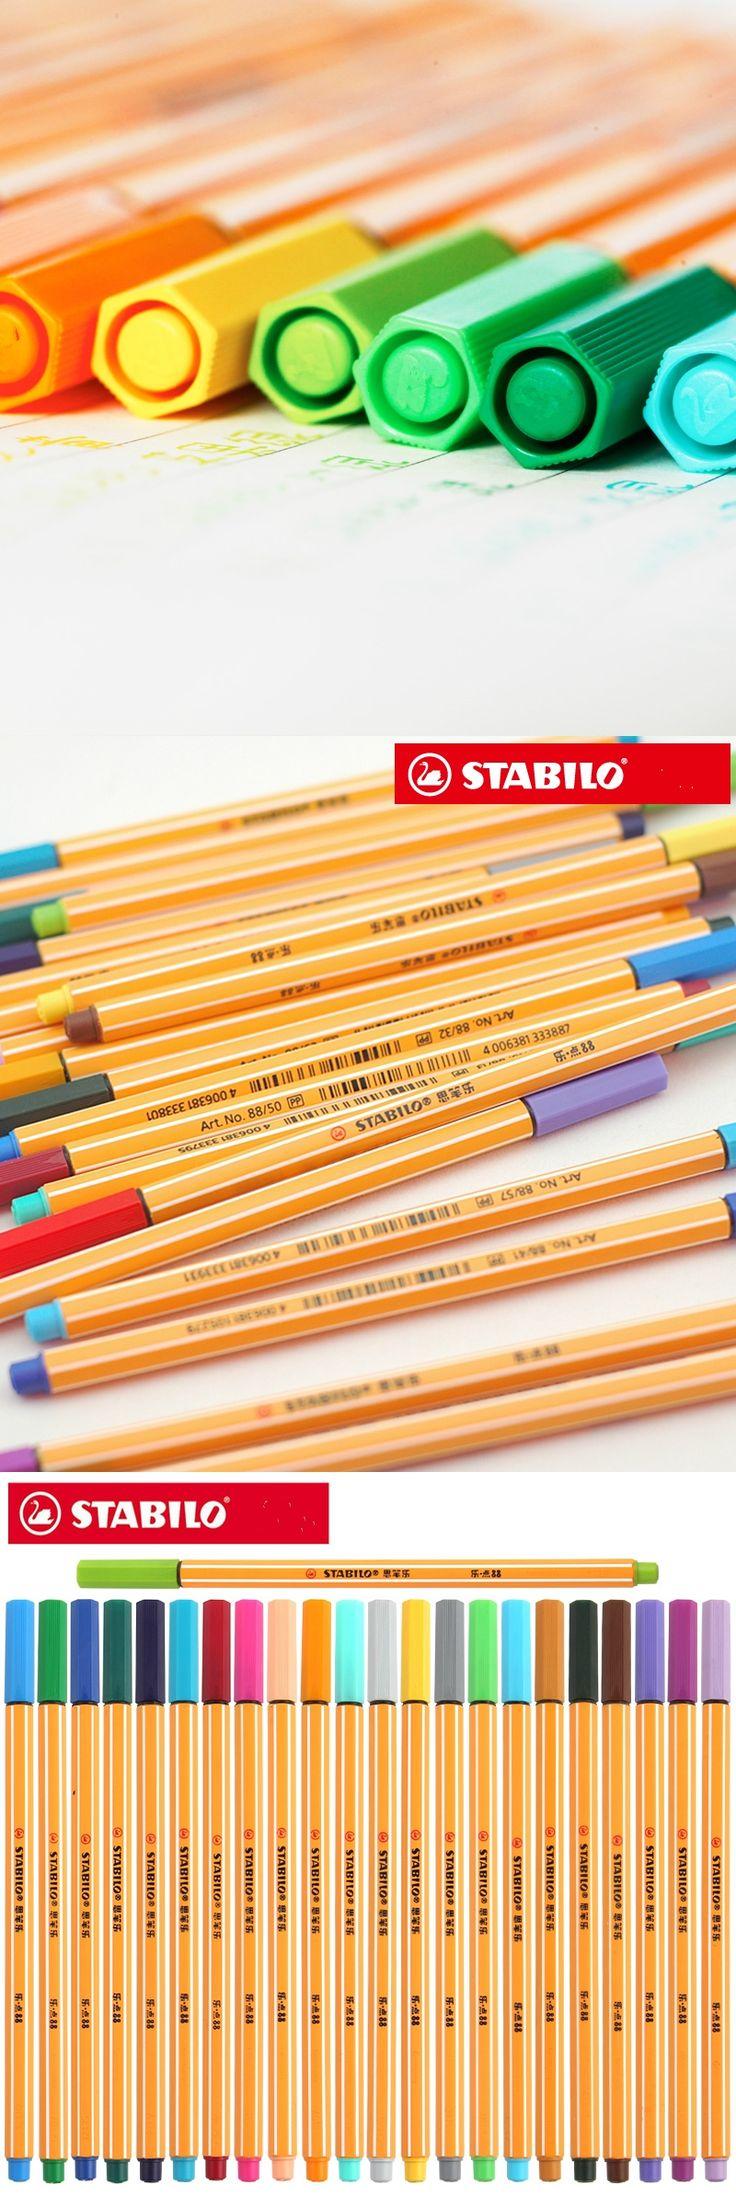 25pcs Germany STABILO 88 fiber pen 0.4mm fine sketch needle technical pen multifunction ink gel pen marker paperlaria escolar